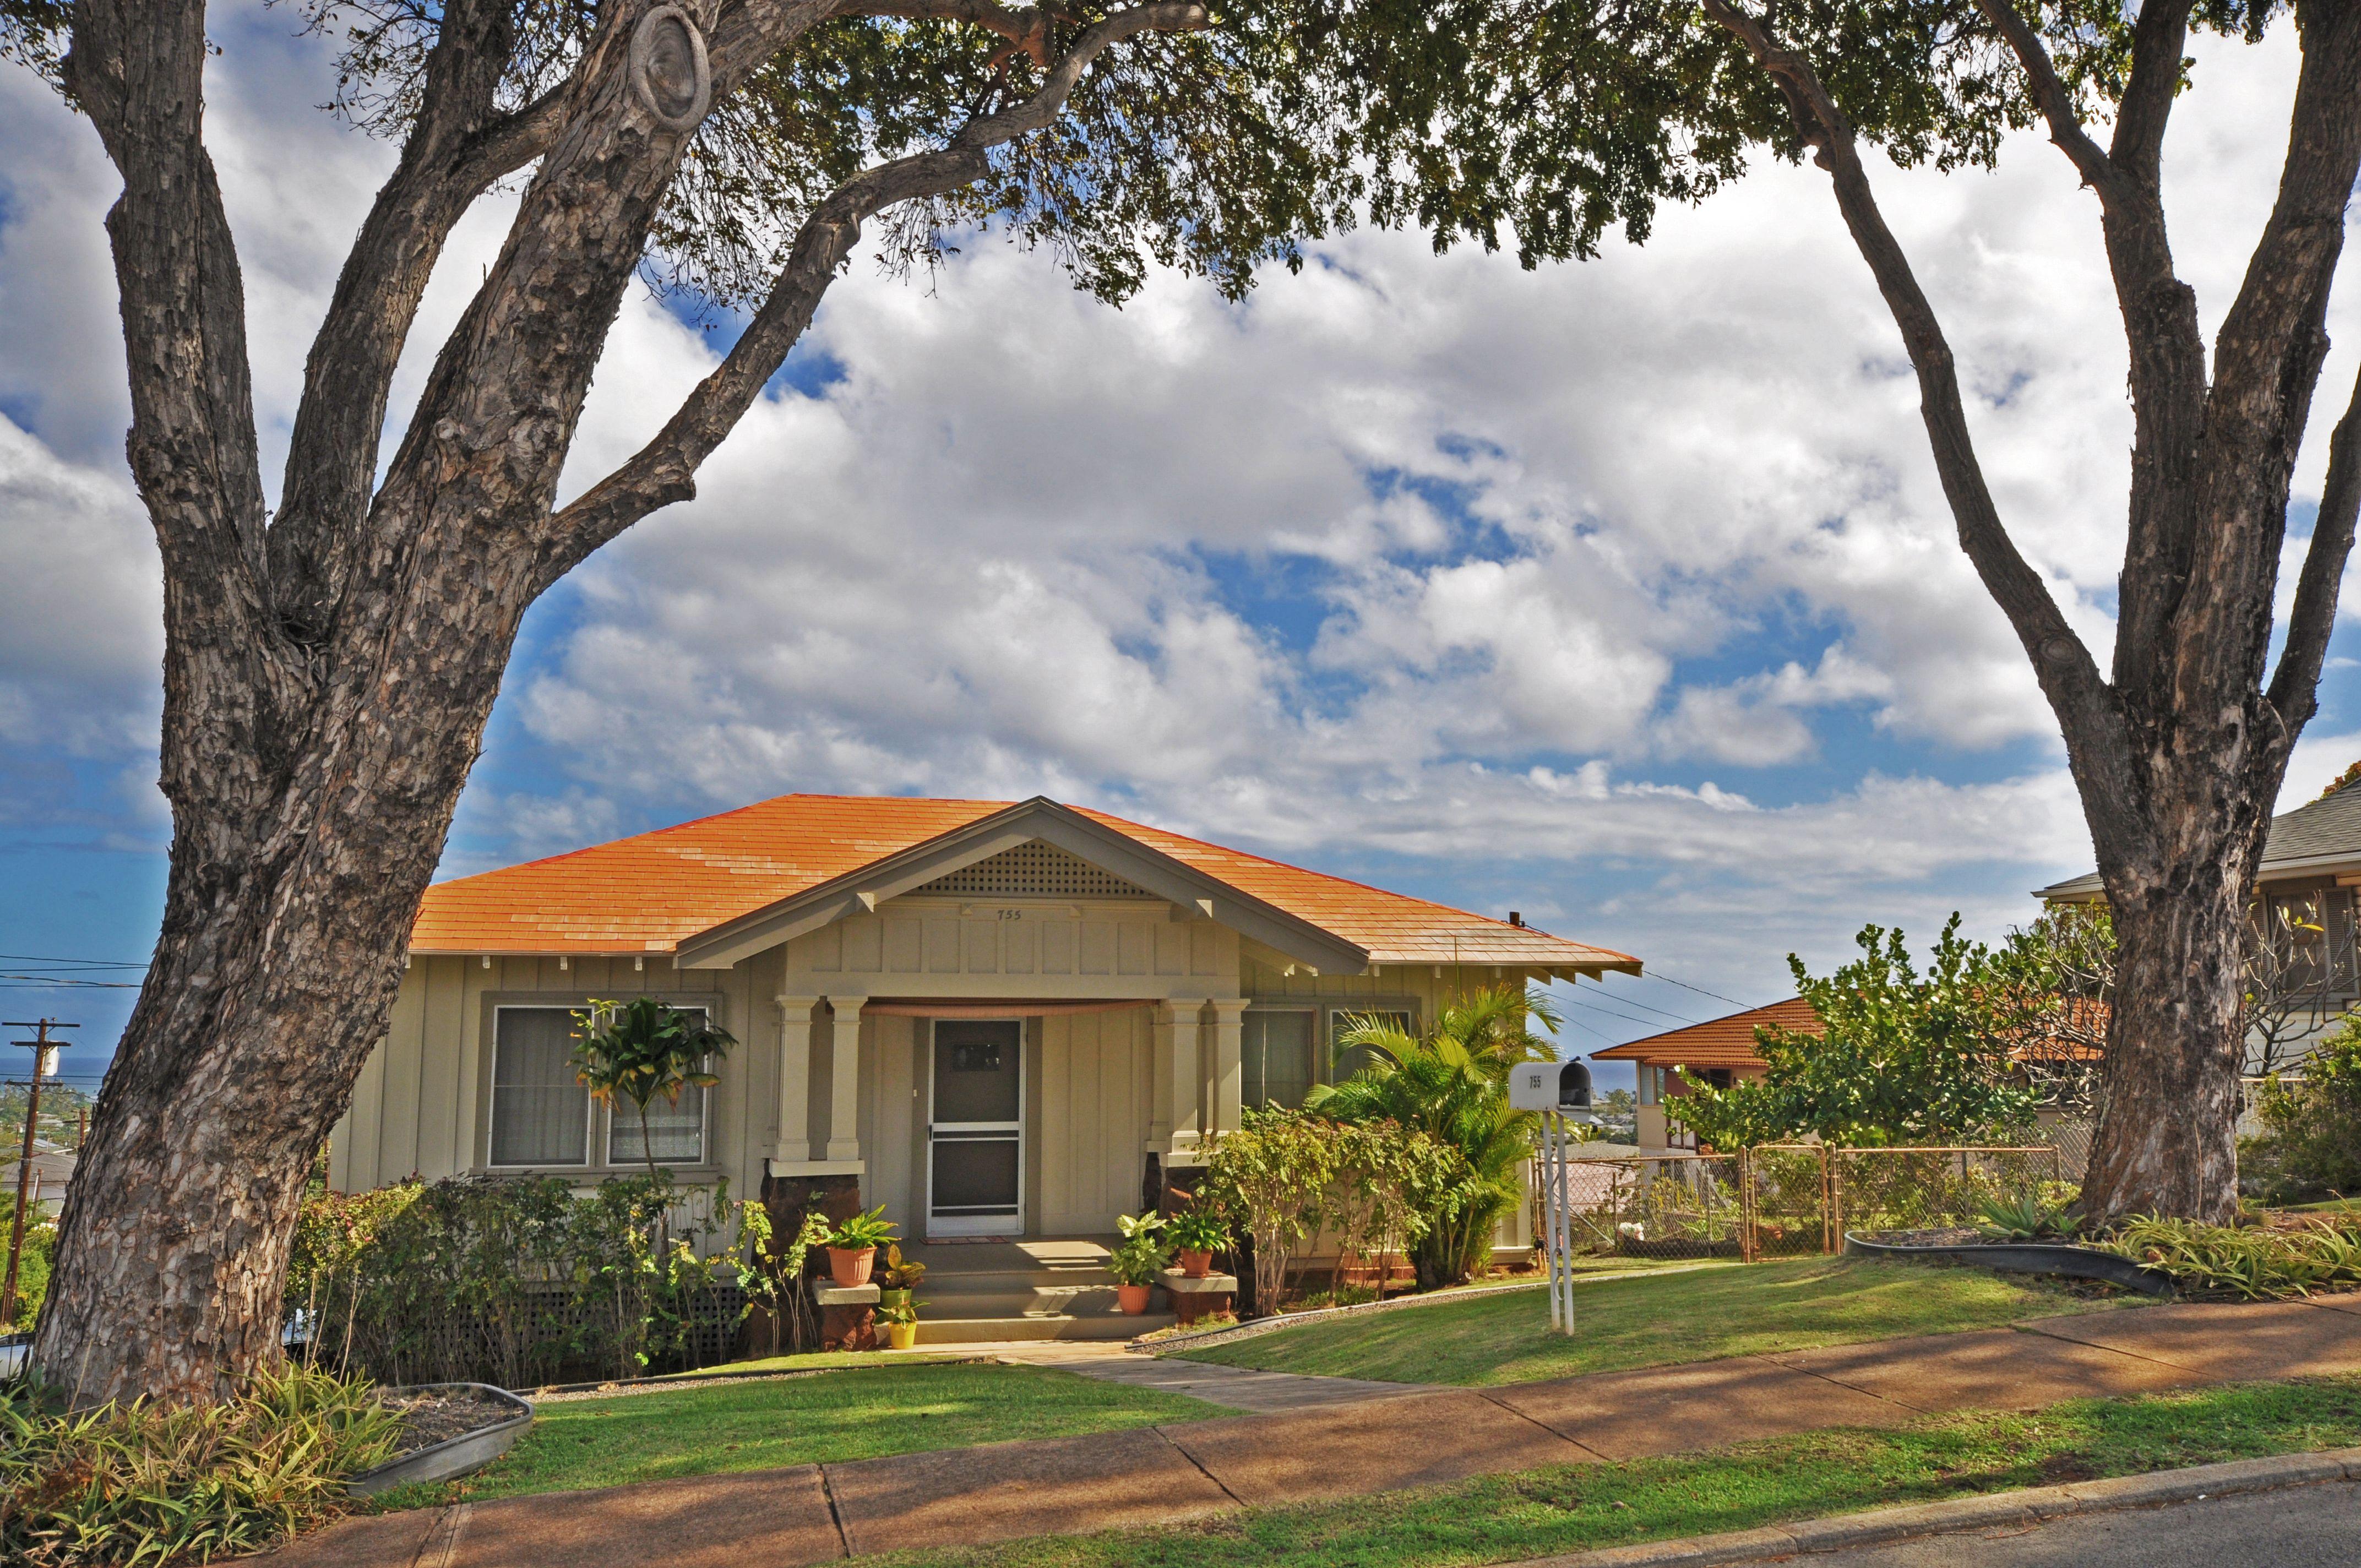 Honolulu Real Estate | Kaimuki Historic Homes | Oahu Hawaii Real Estate  Blog   Real Estate In Kailua And Honolulu Homes For Sale